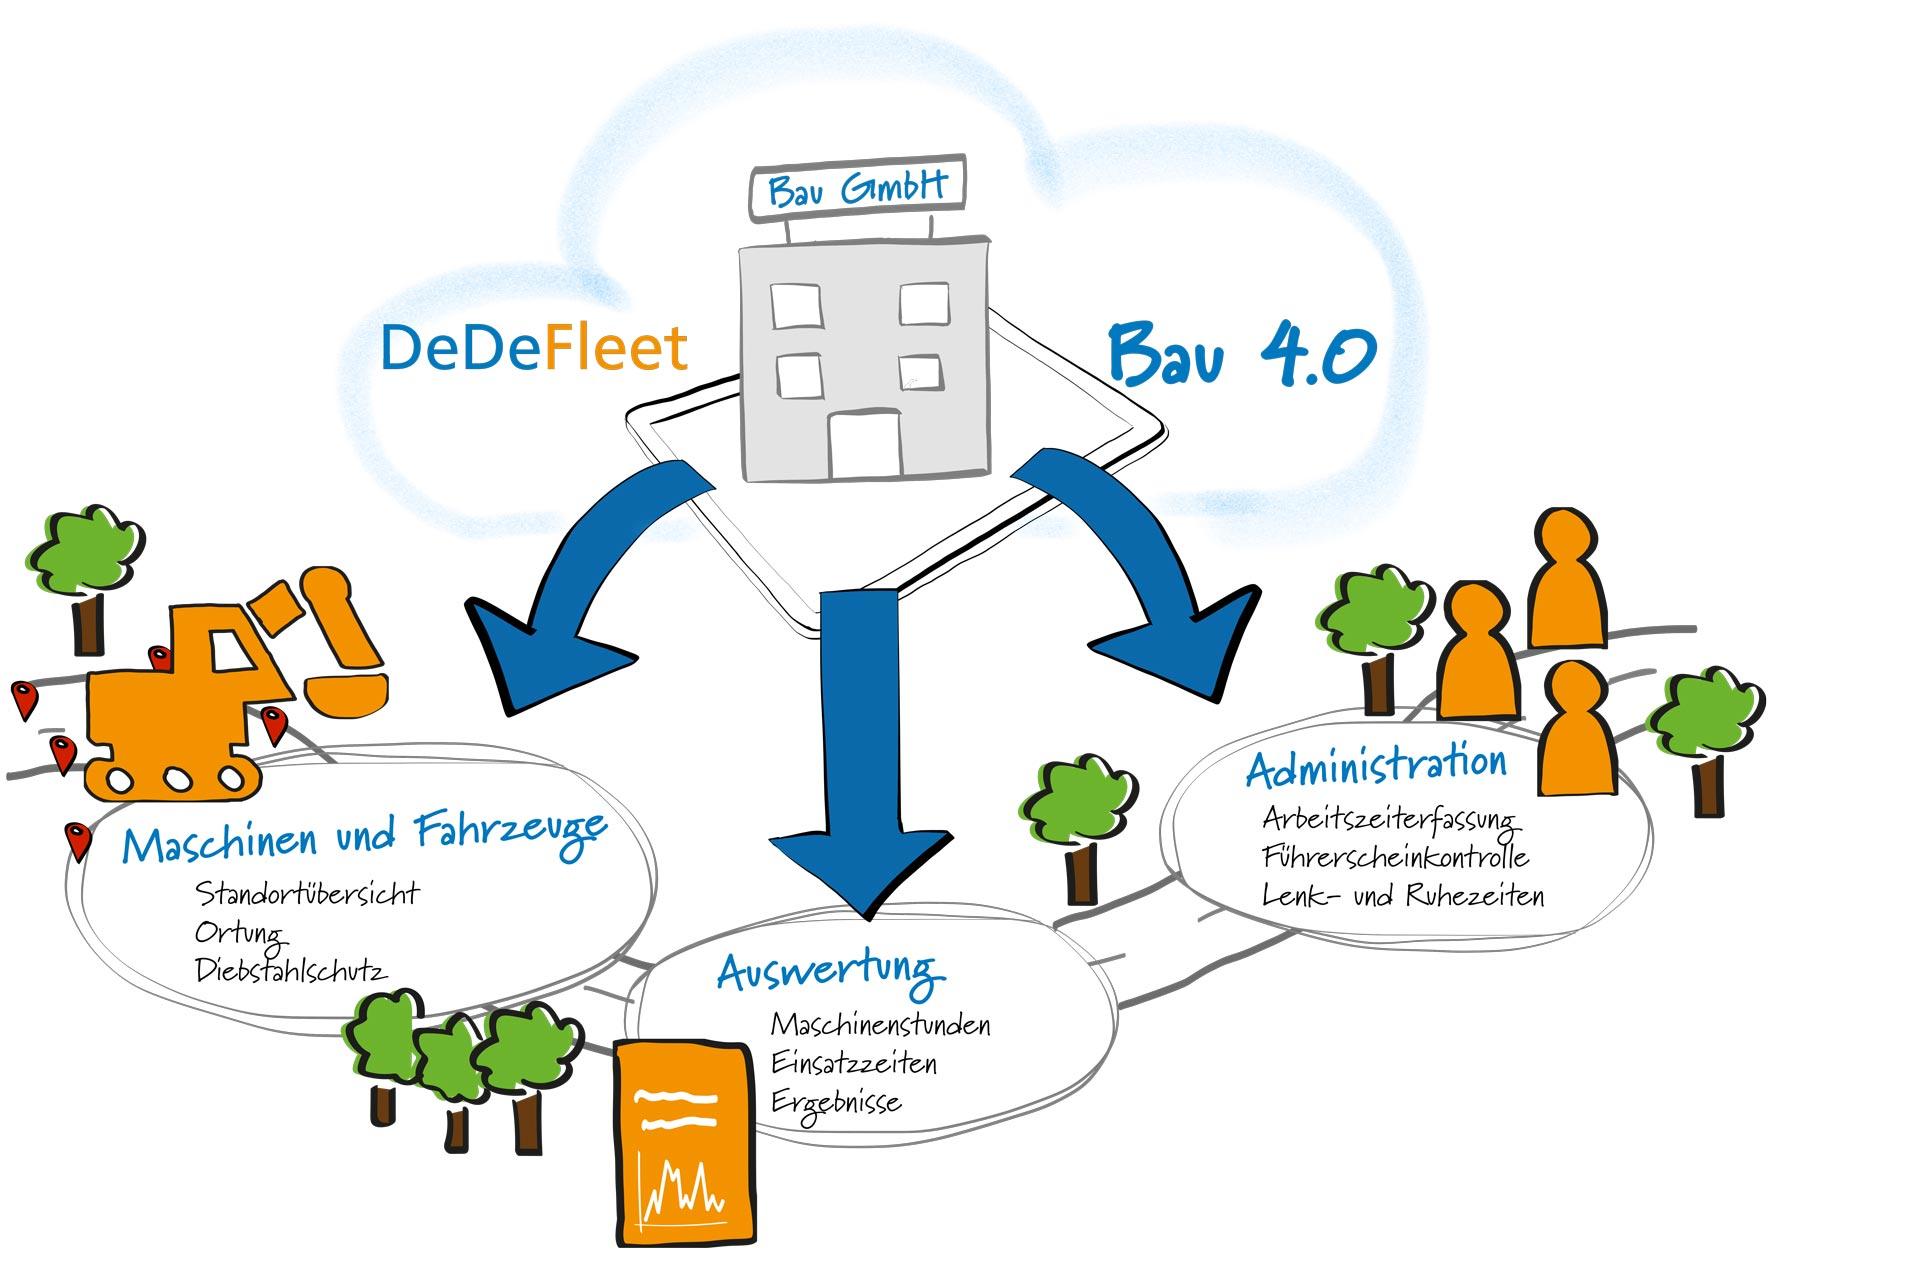 DeDeFleet Bau 4.0